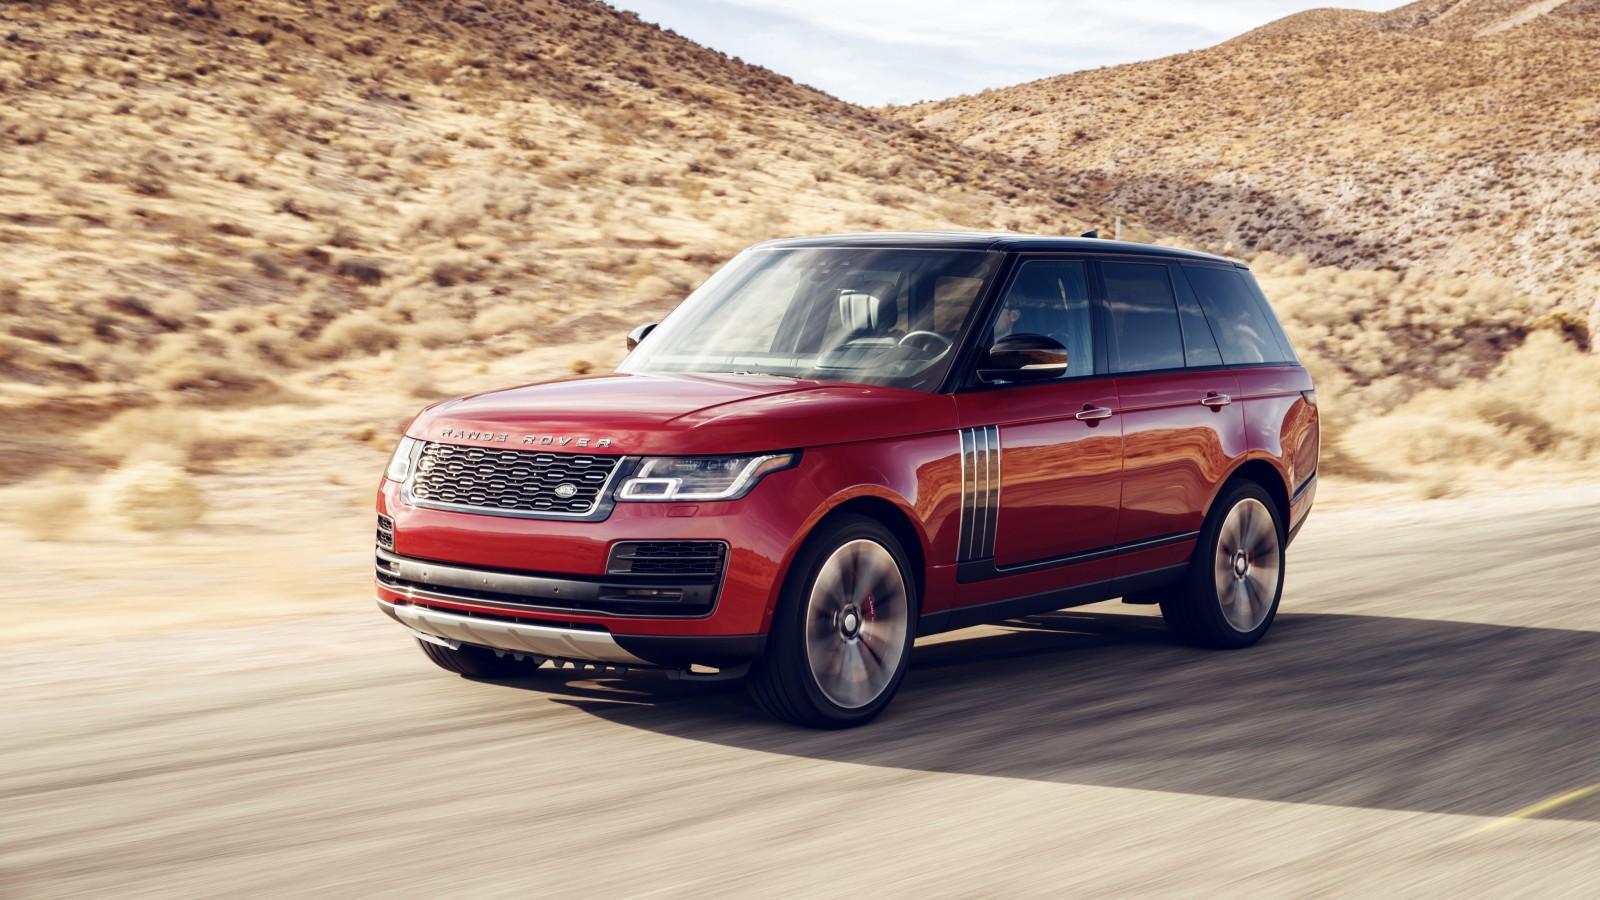 Range Rover Svautobiography Dynamic K X on Land Rover Lrx Concept Interior